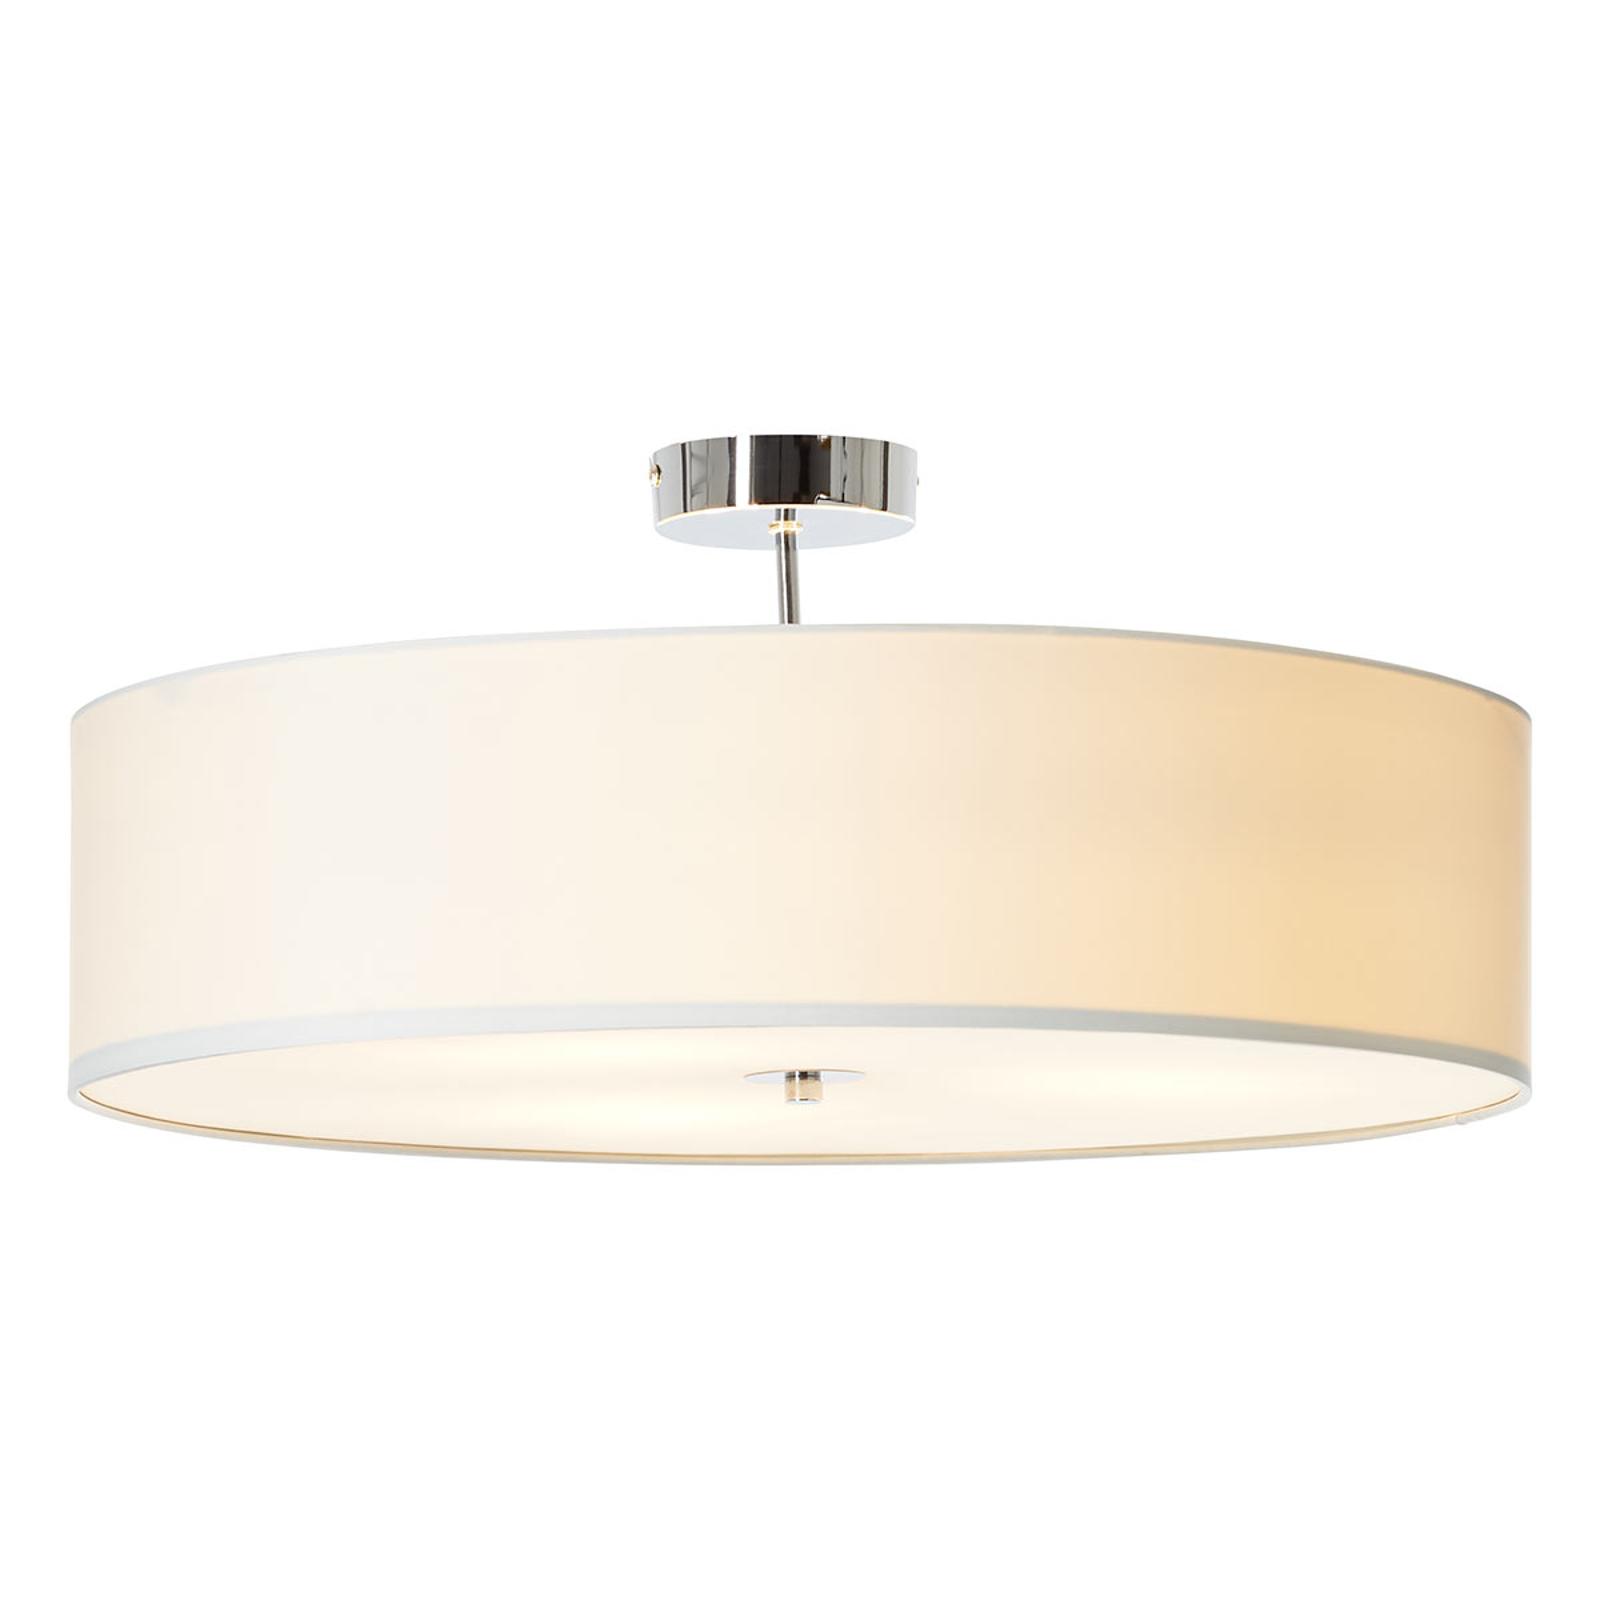 Textiel plafondlamp Andria, 60 cm, wit